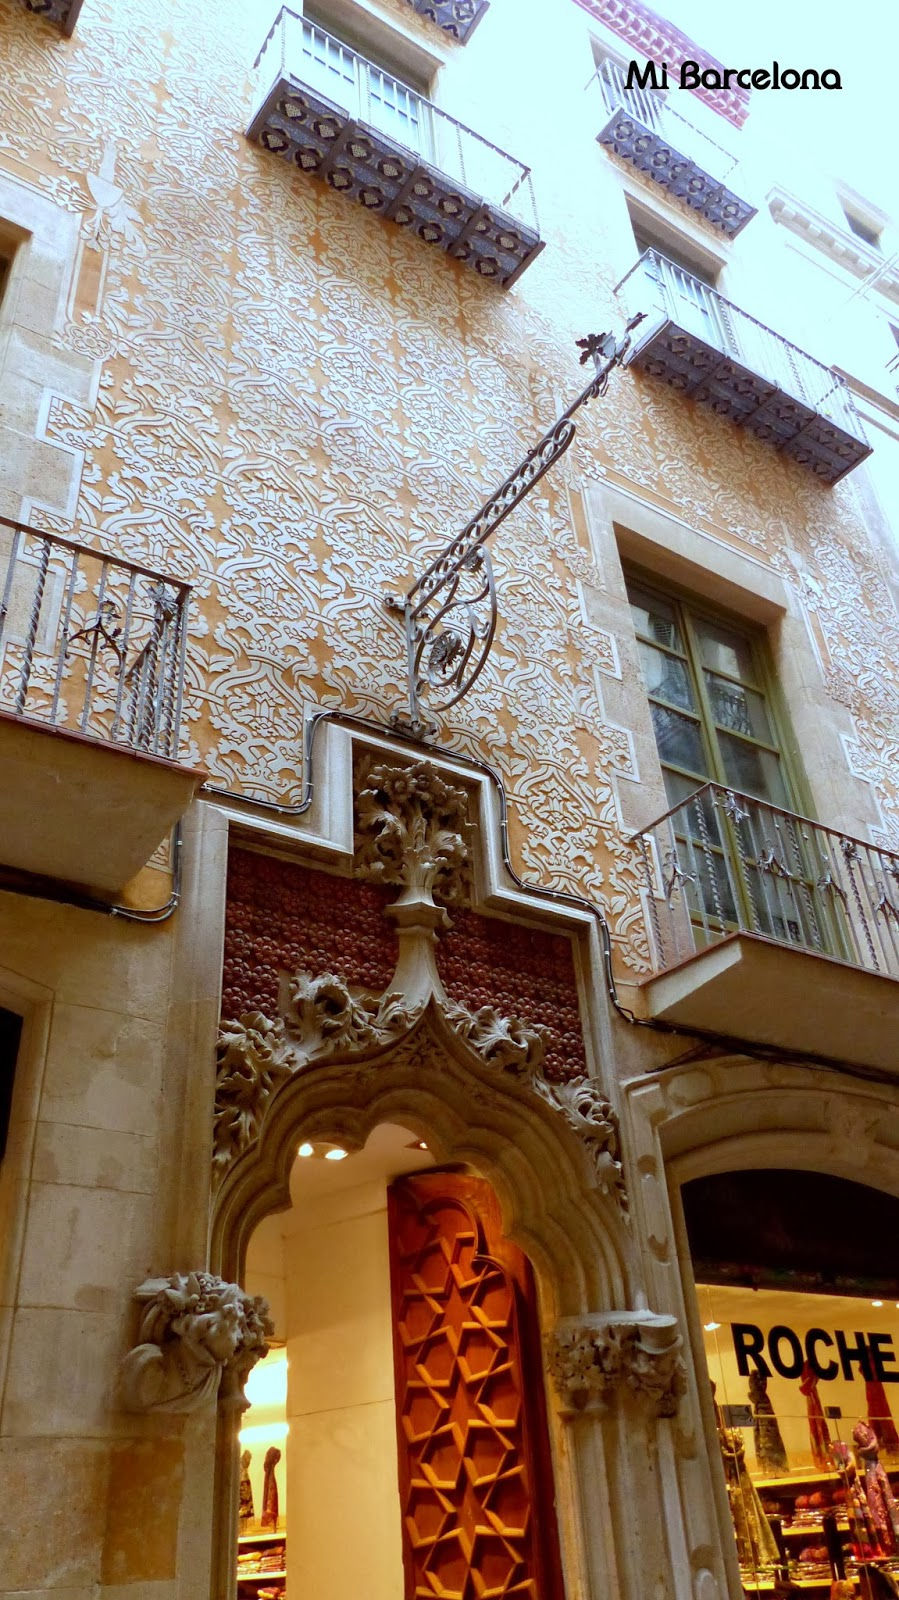 Mi barcelona juego 19 d nde est el jard n secreto de ciutat vella Villa jardin donde queda